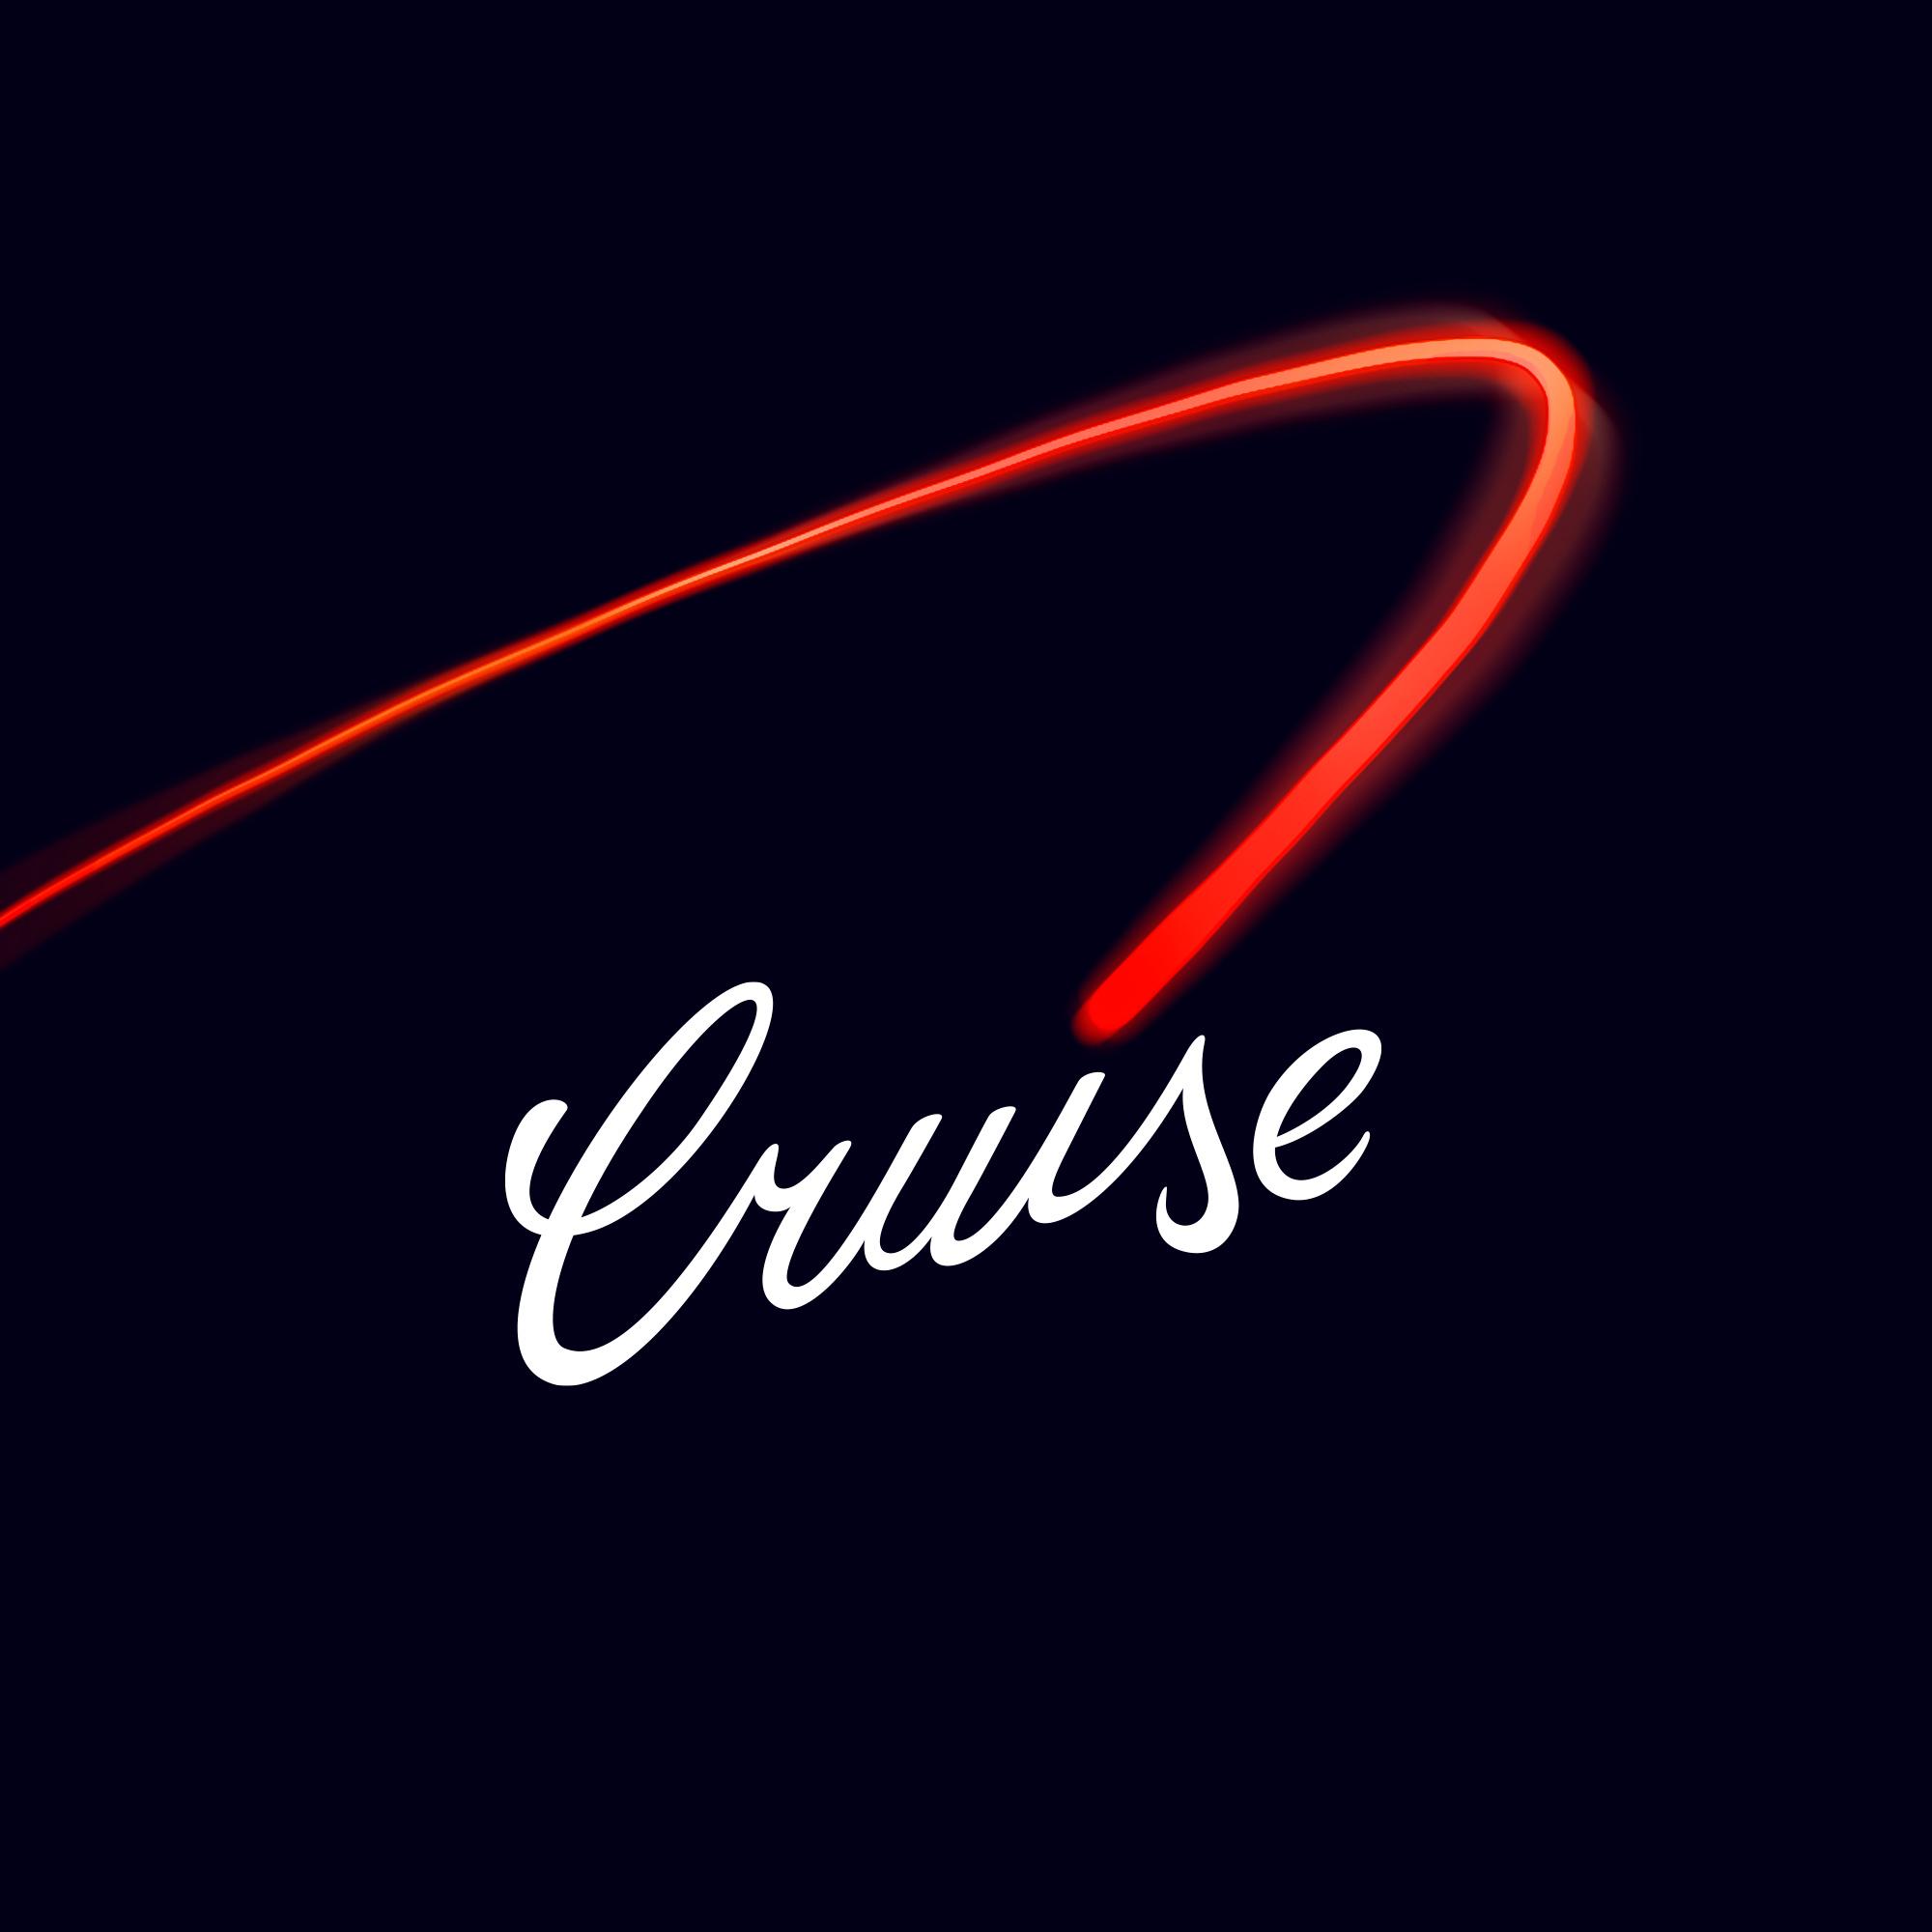 cruise-playlist1.jpg